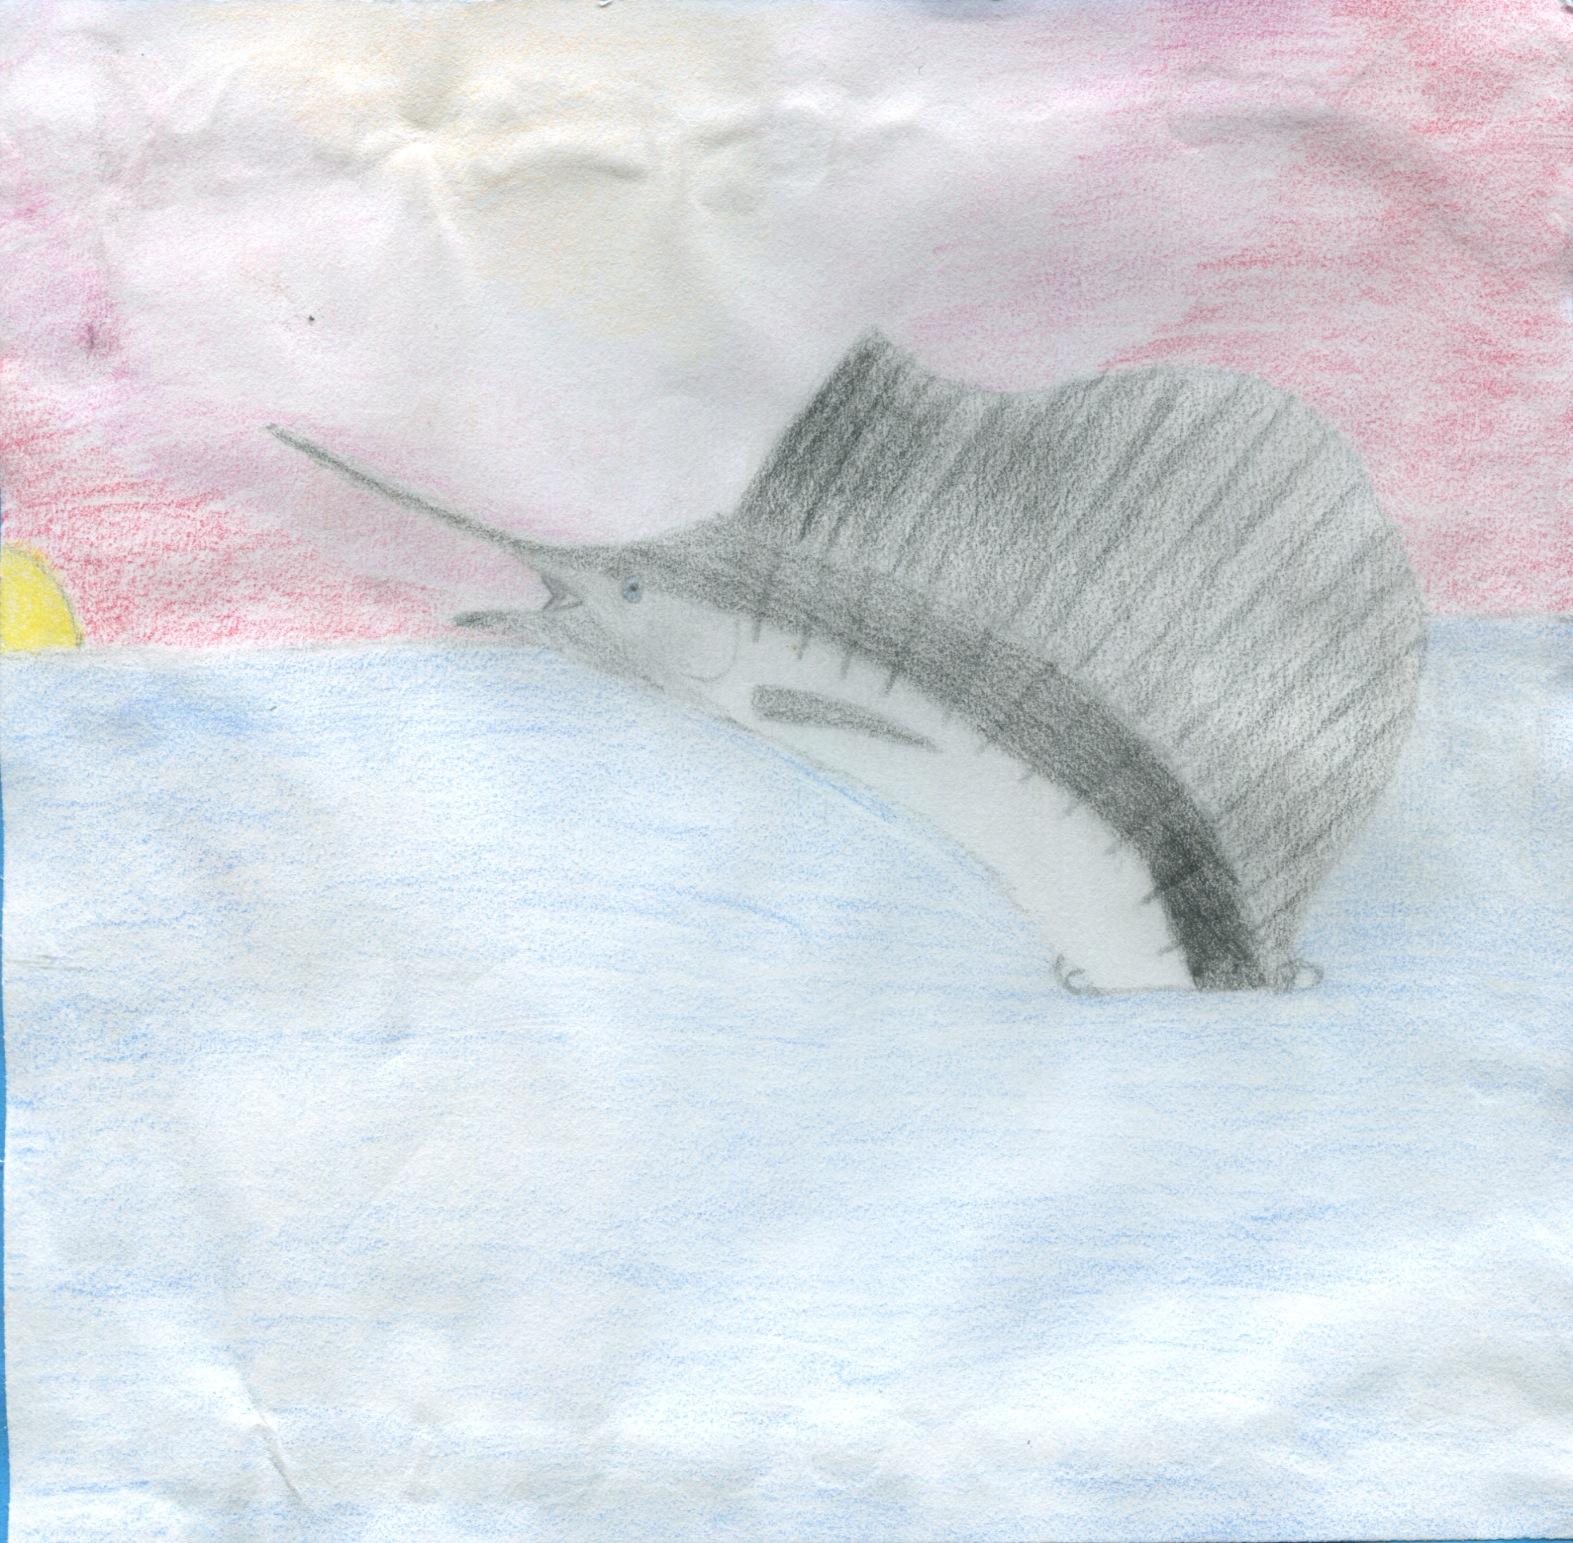 Keelan Priscolt, 14